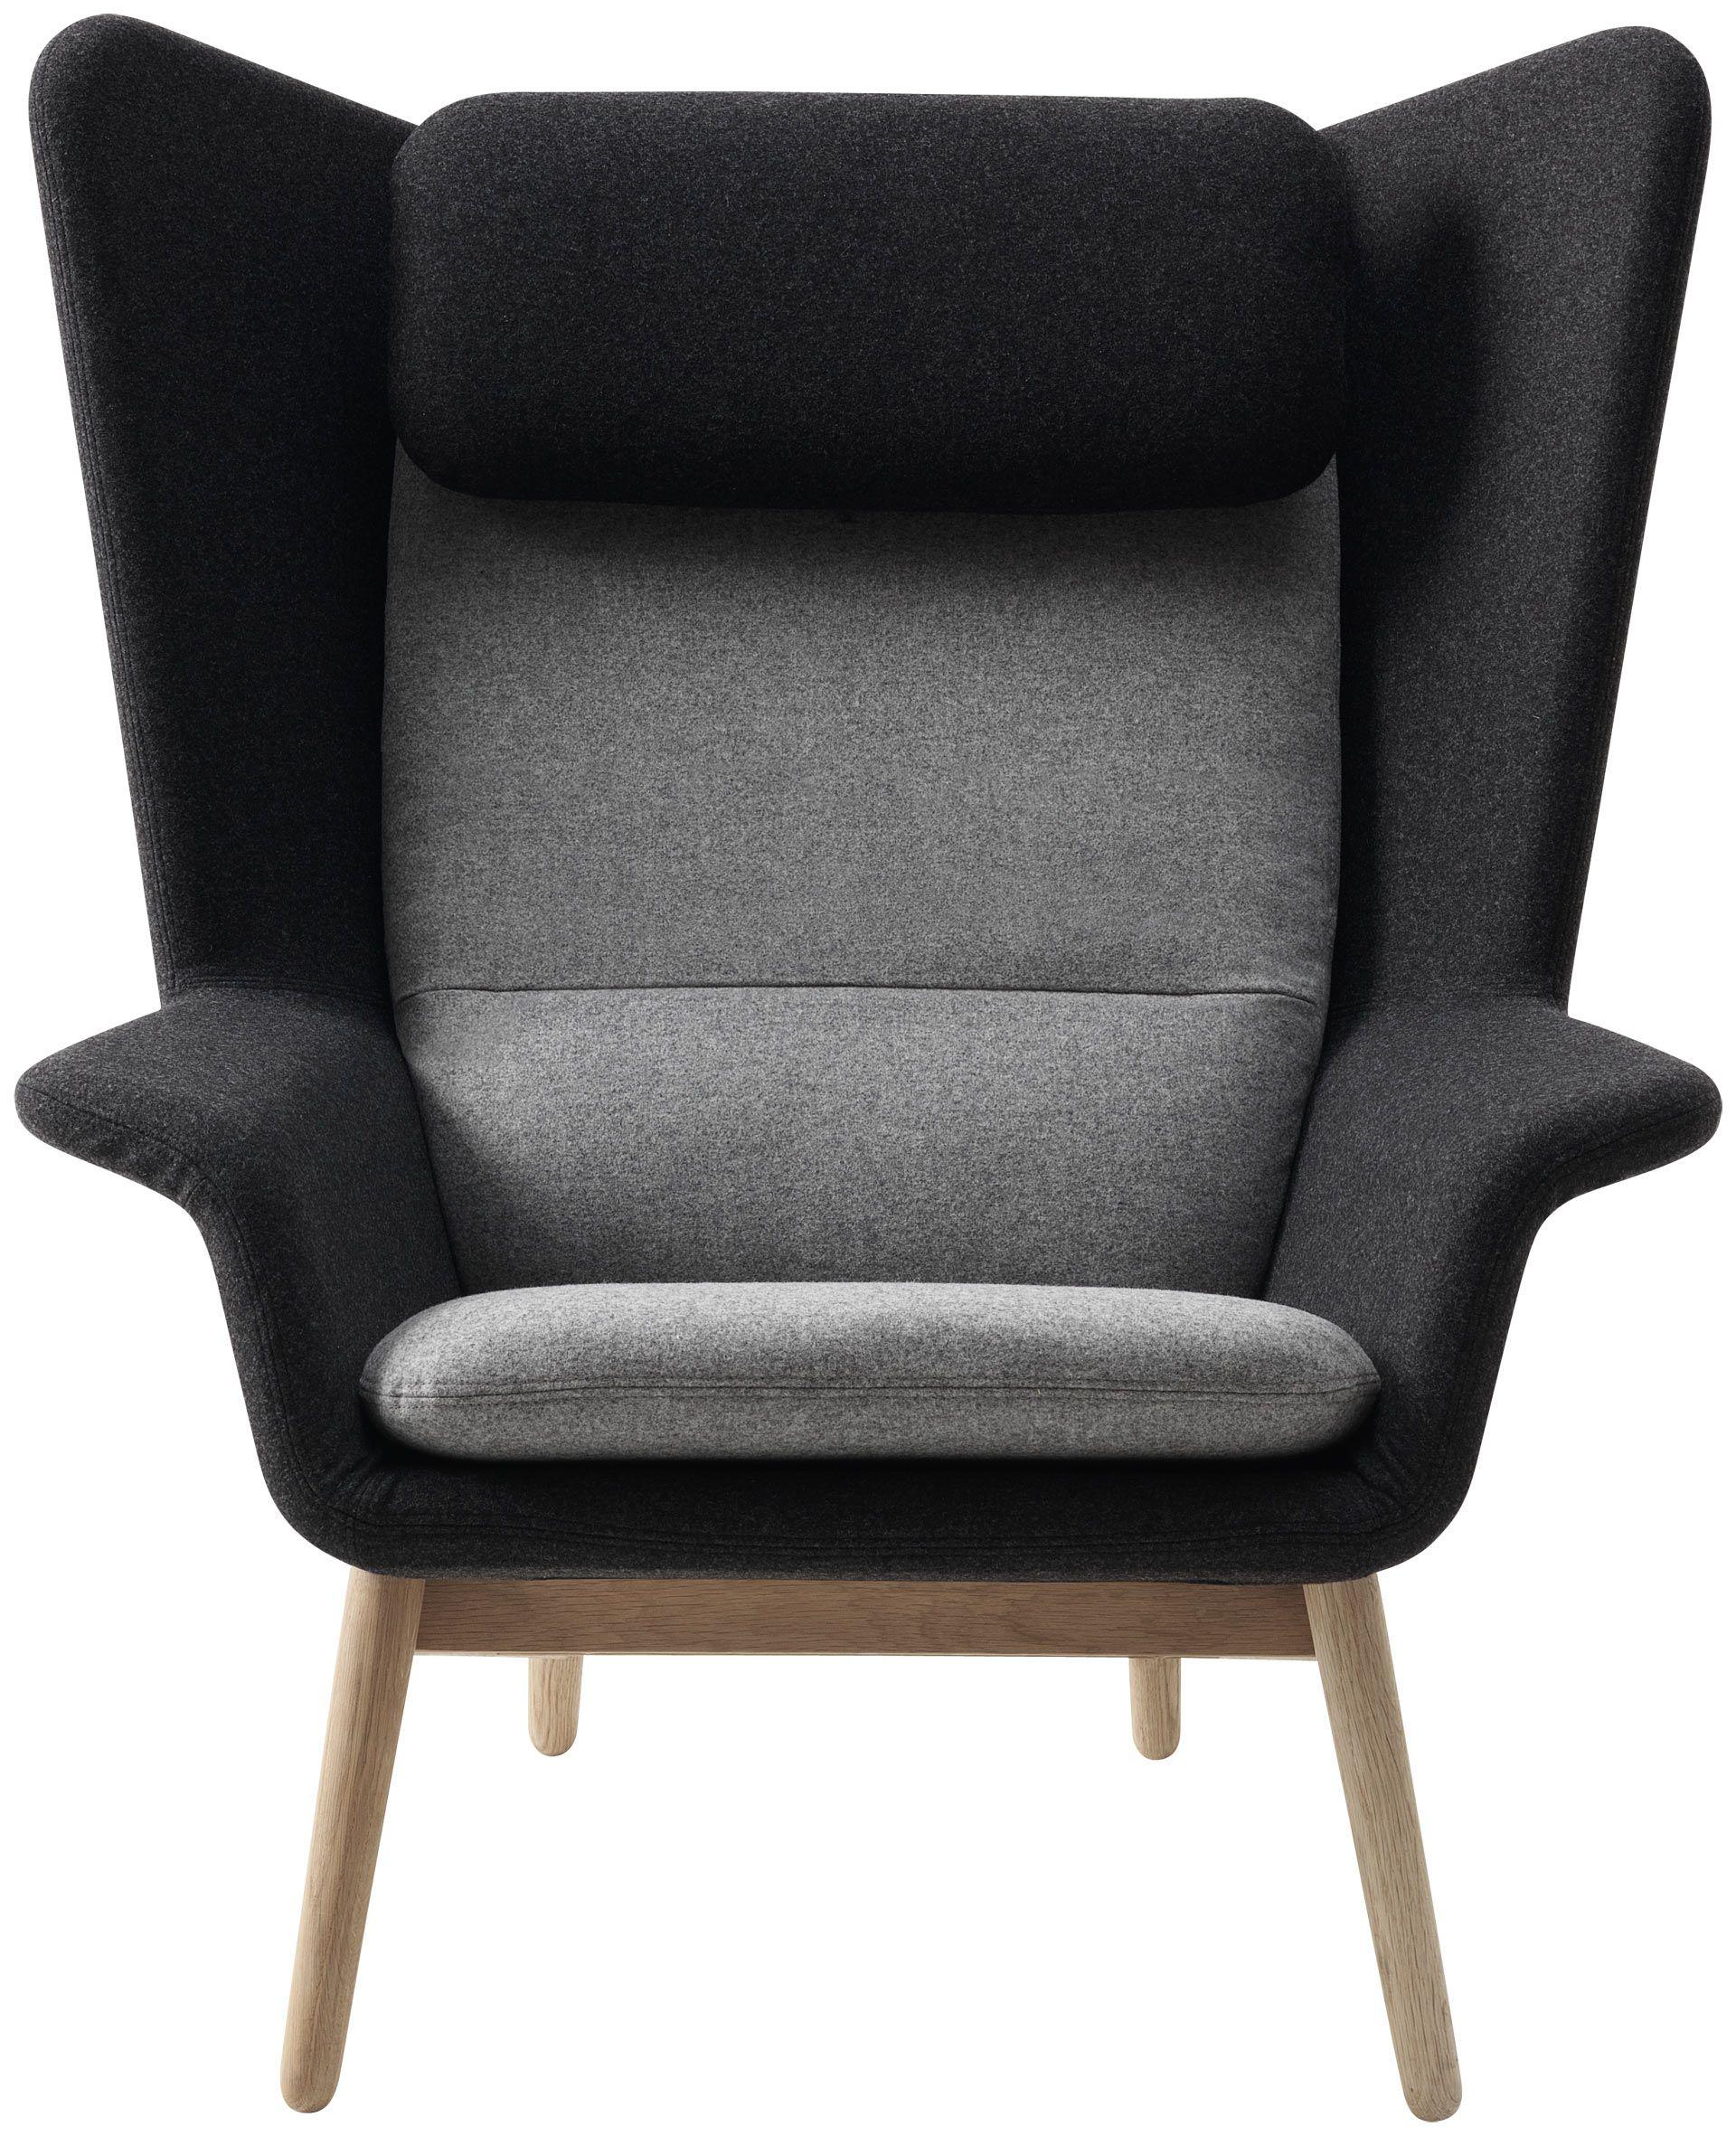 Wonderful BoConcept Hamilton Chair   Two Toned Grey Felt